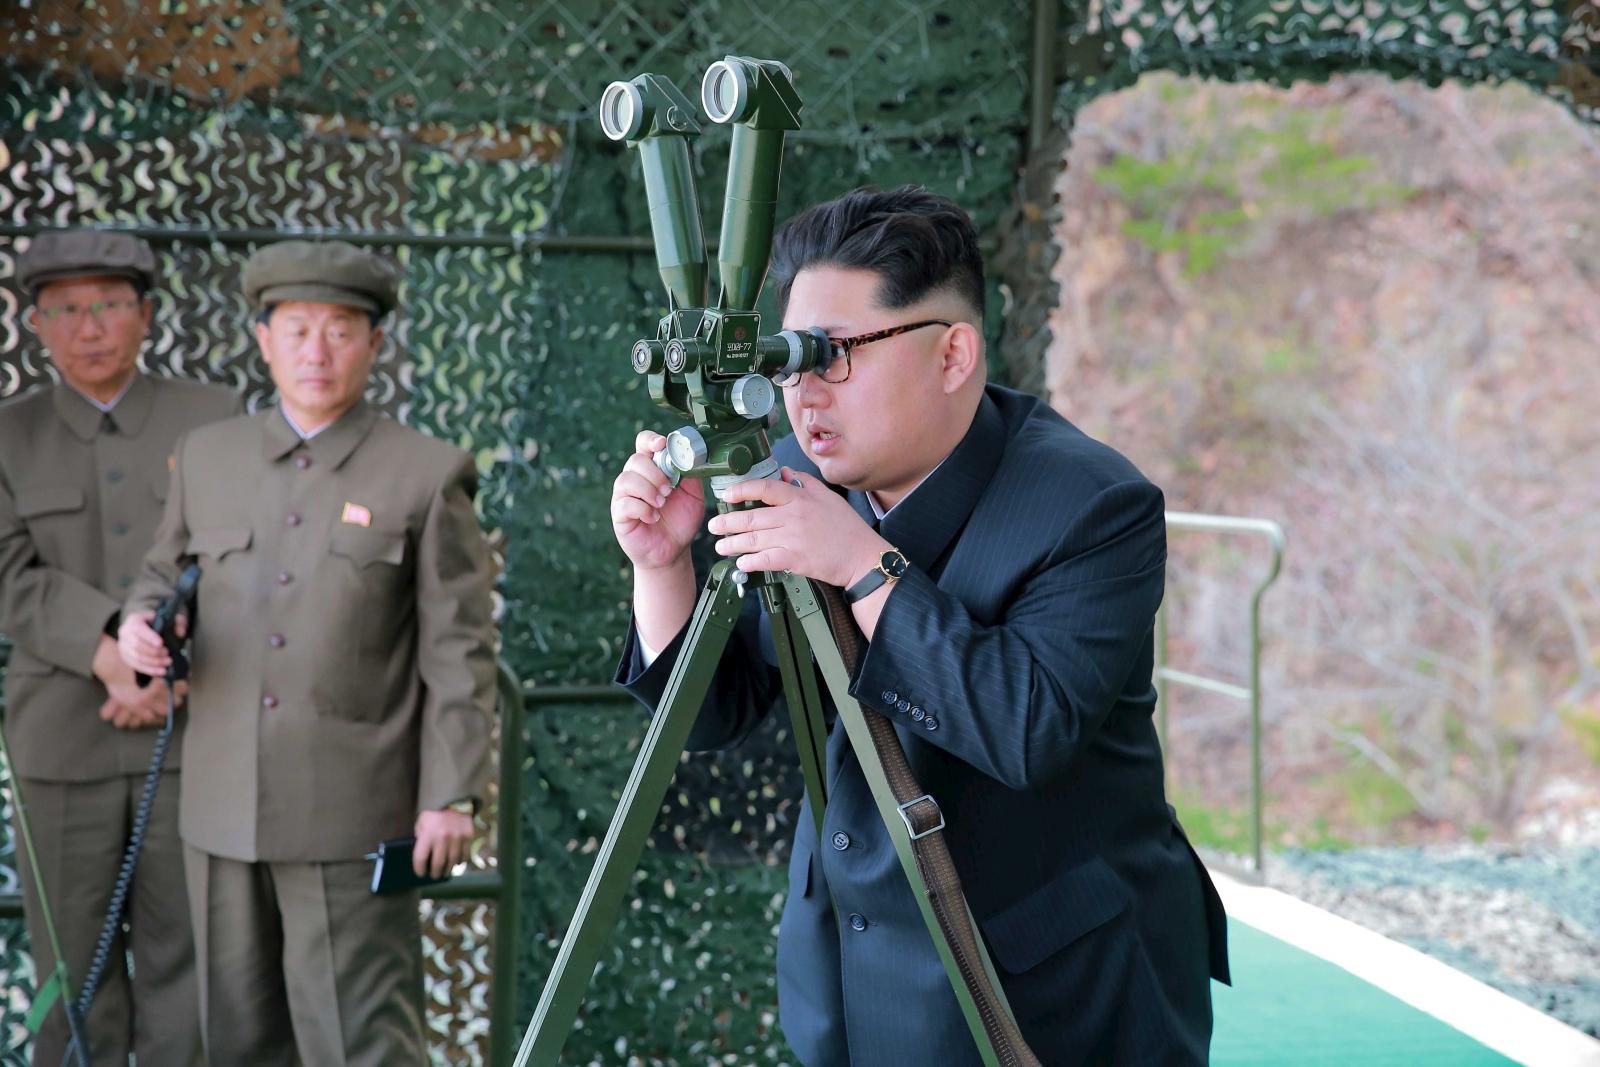 North Korea submarine-launched ballistic missile Kim Jong-un